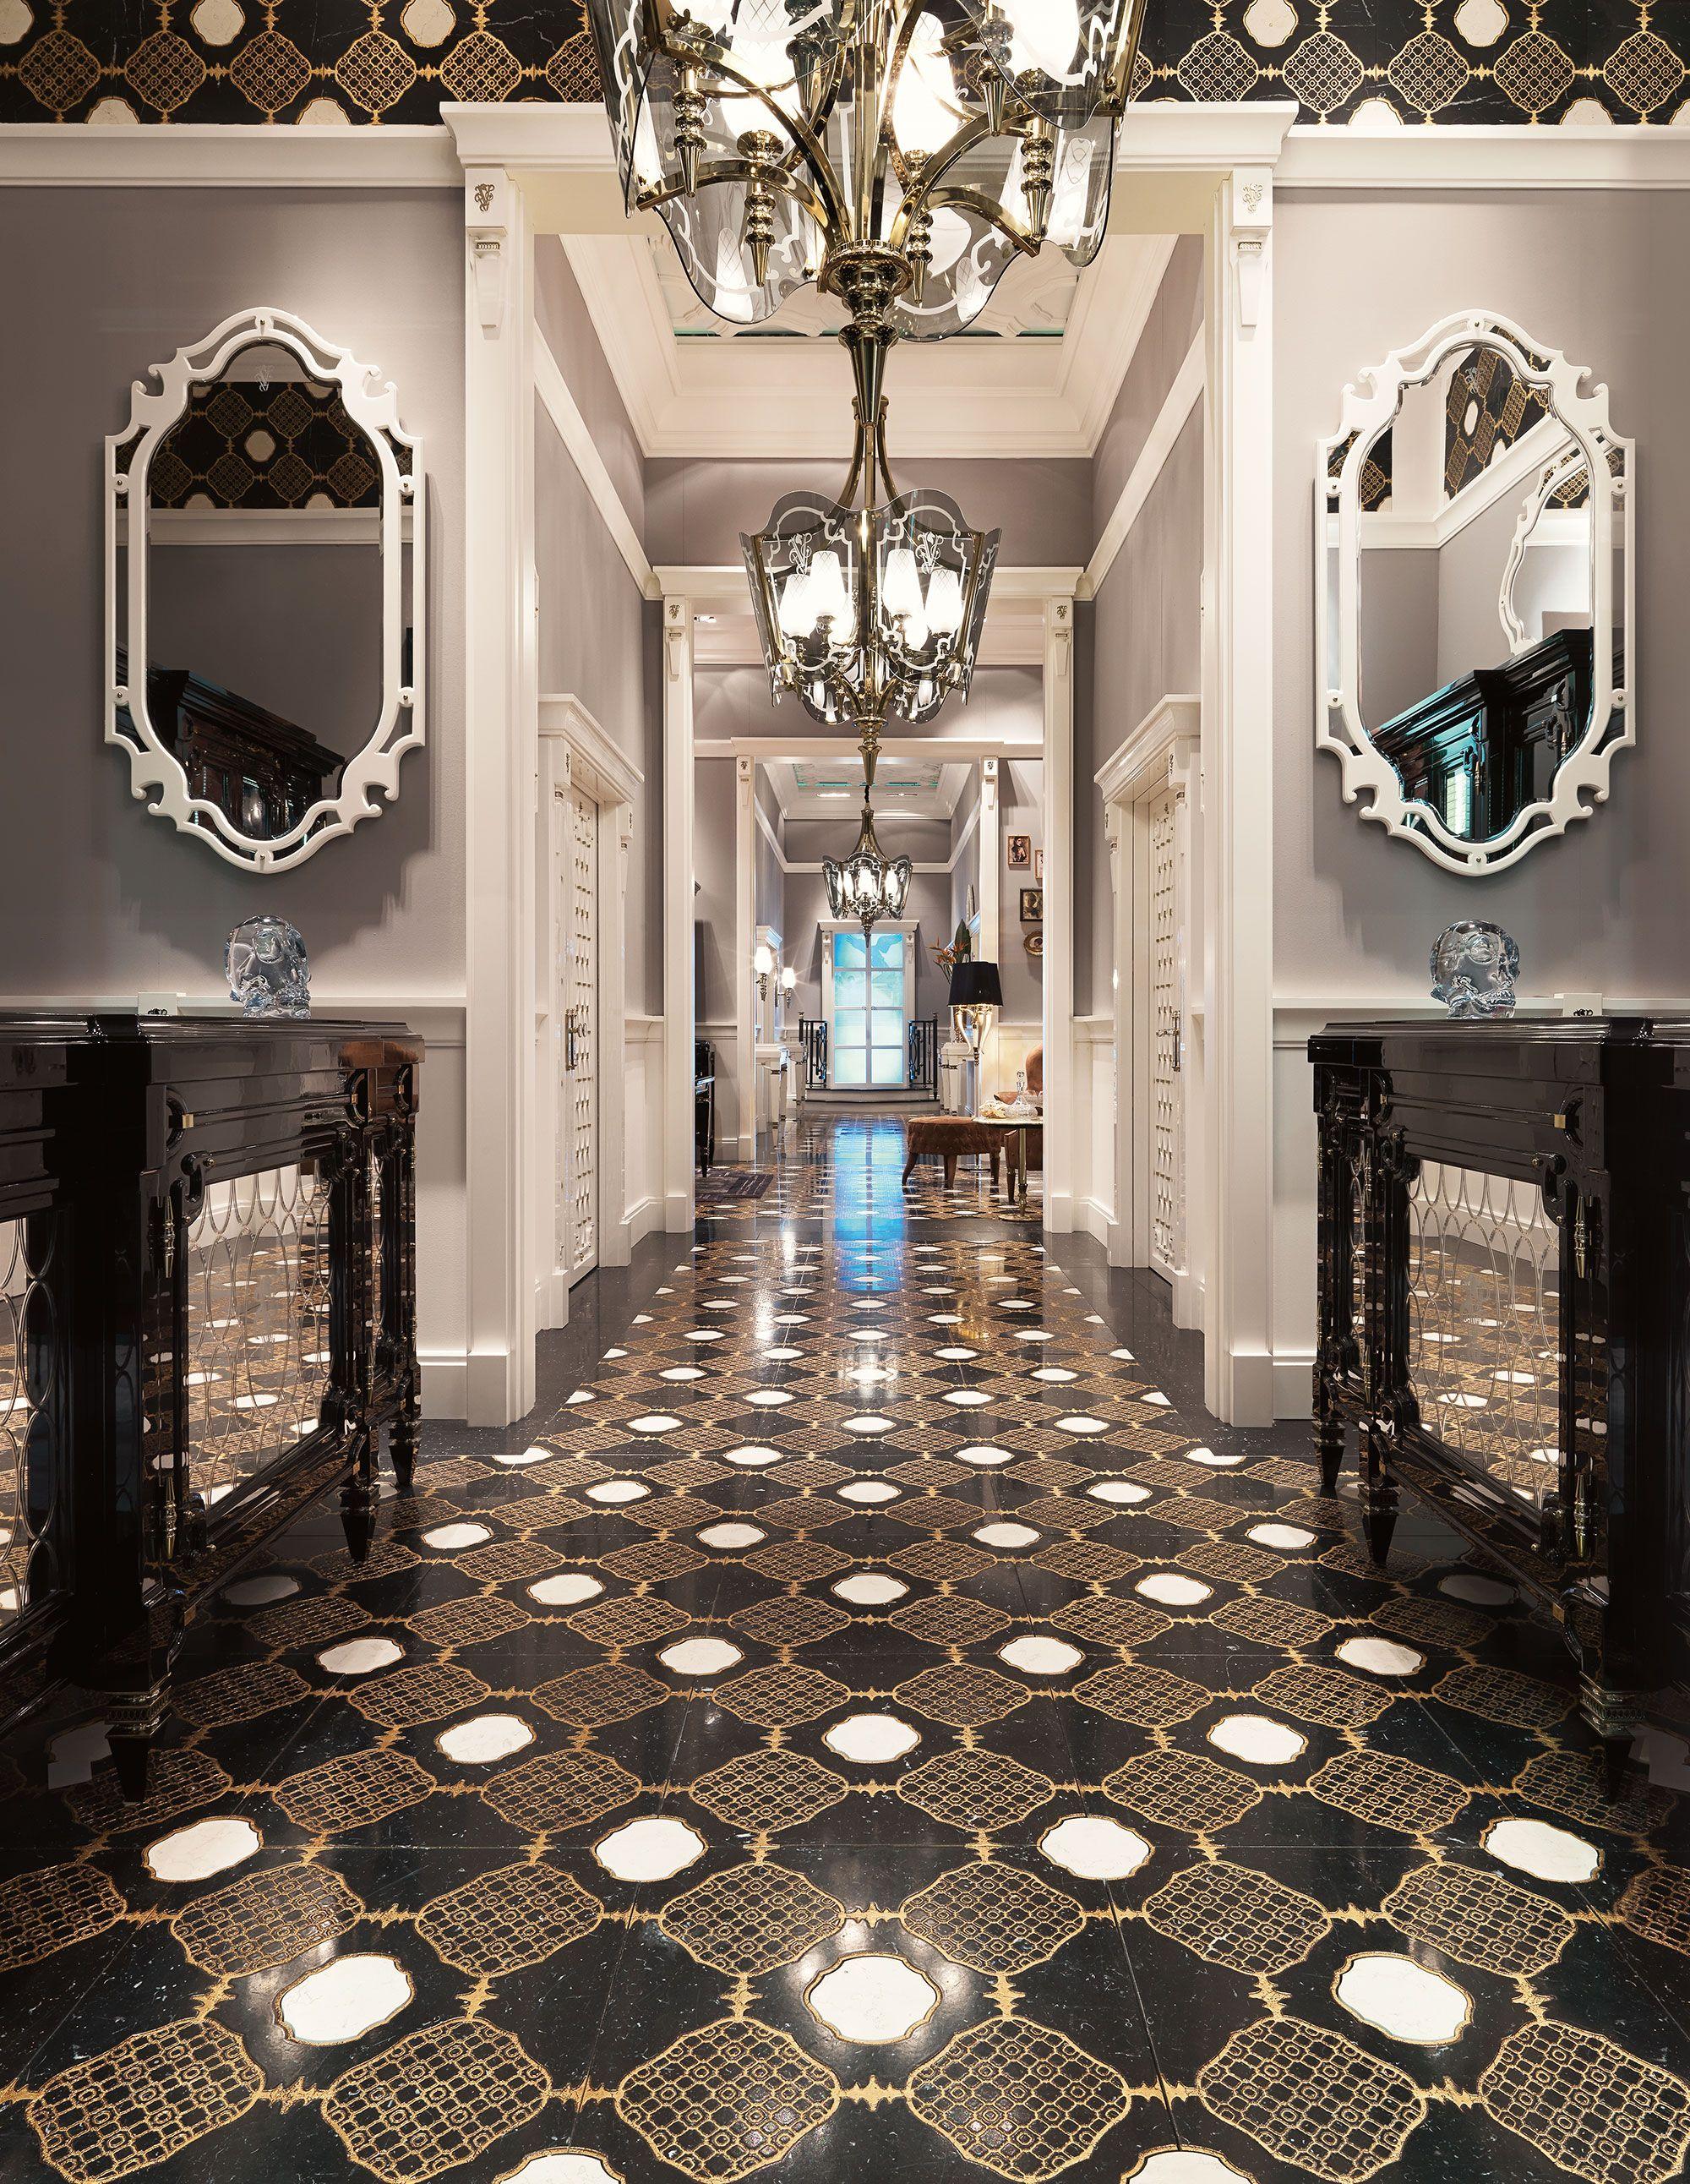 Foyer And Entrance Of The Windsor Hotel : Windsor entrance hall livingroom luxury